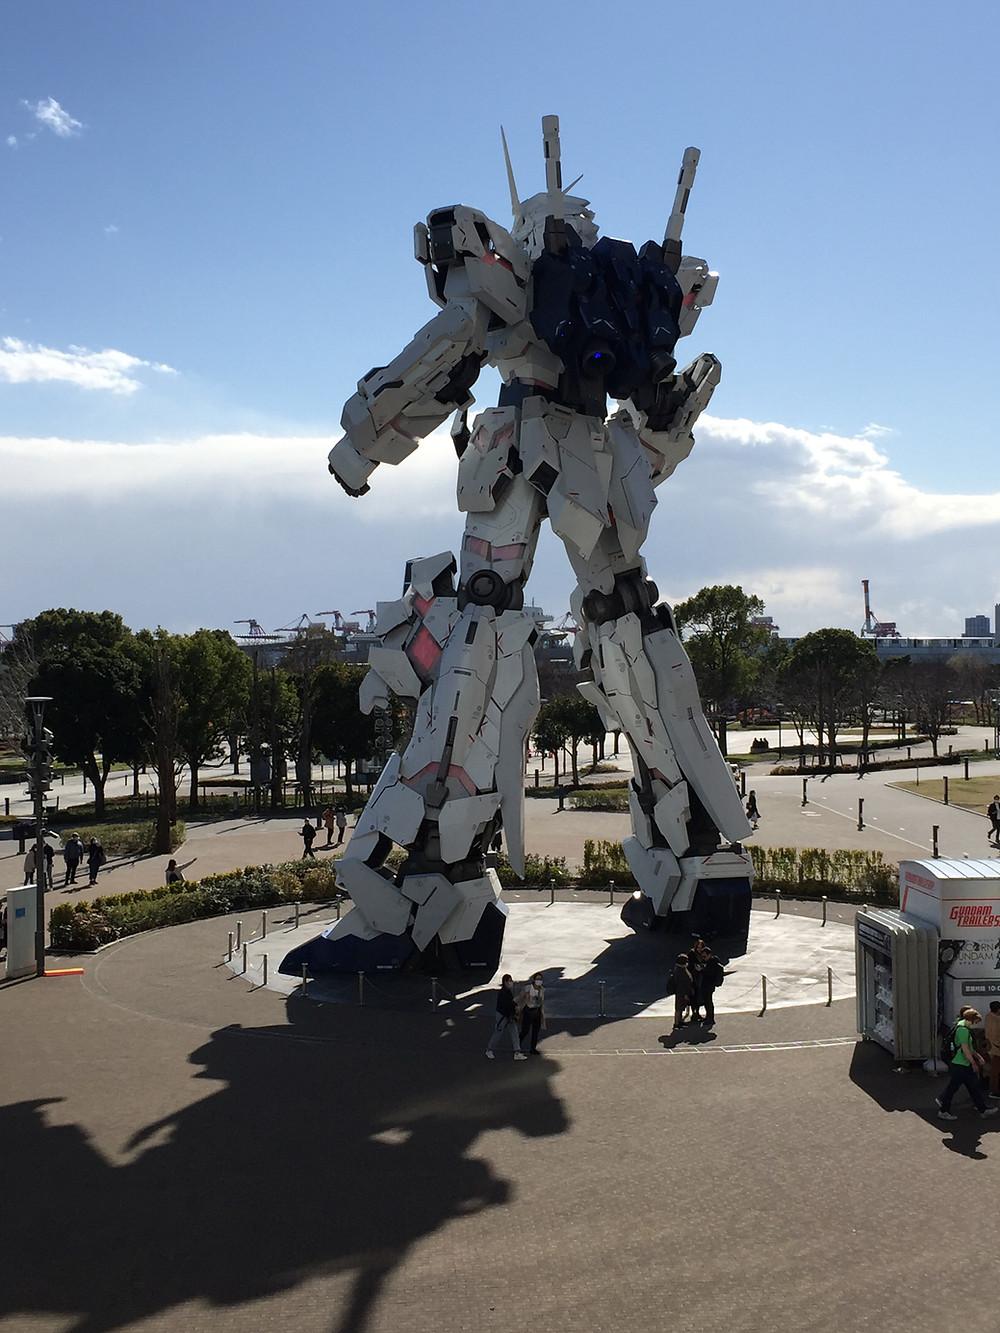 Massive robot statue!